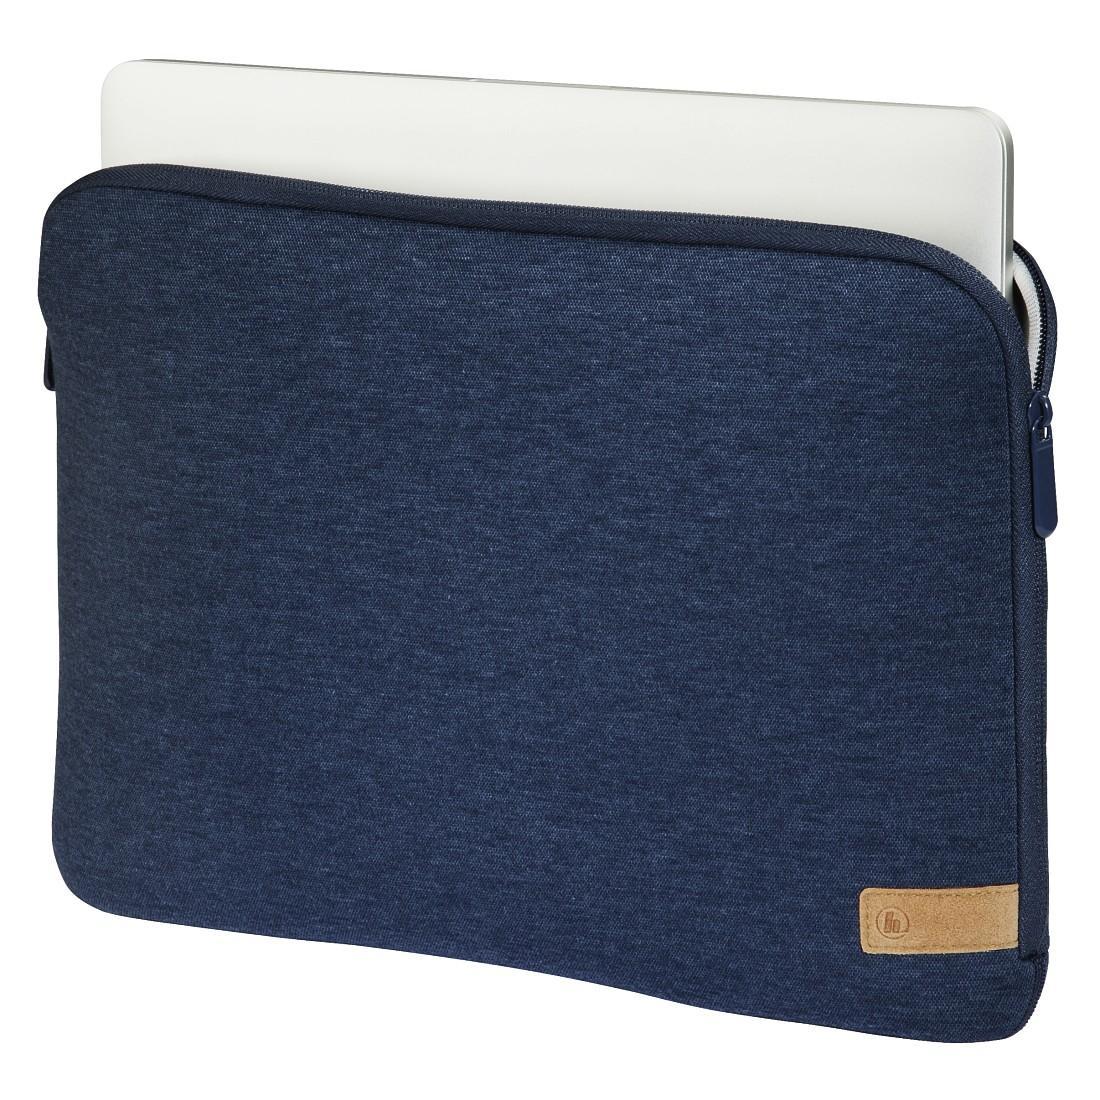 "Универсален калъф за лаптоп HAMA Jersey, до 34 см  (13.3""), Син-3"